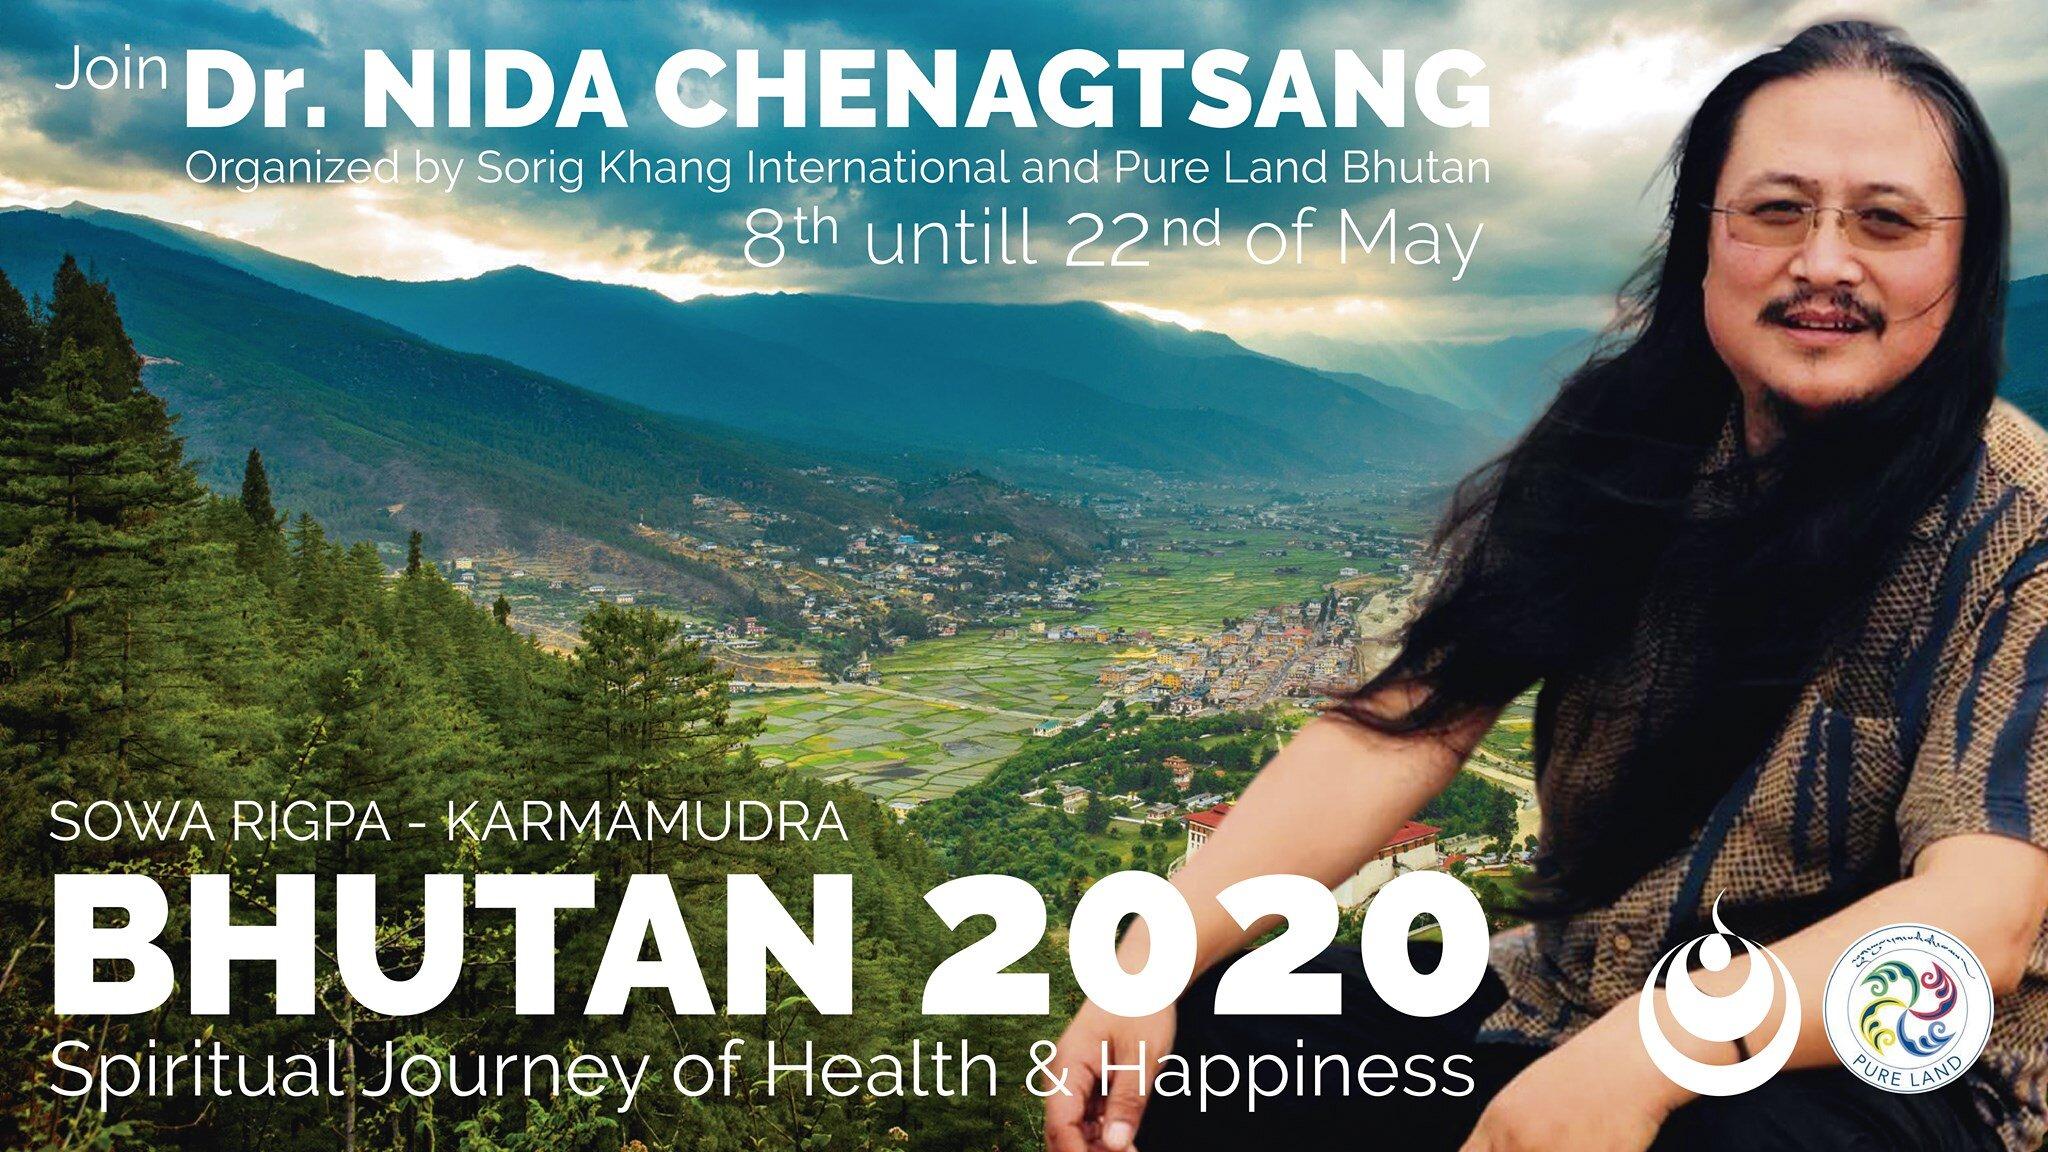 See you in Bhutan!